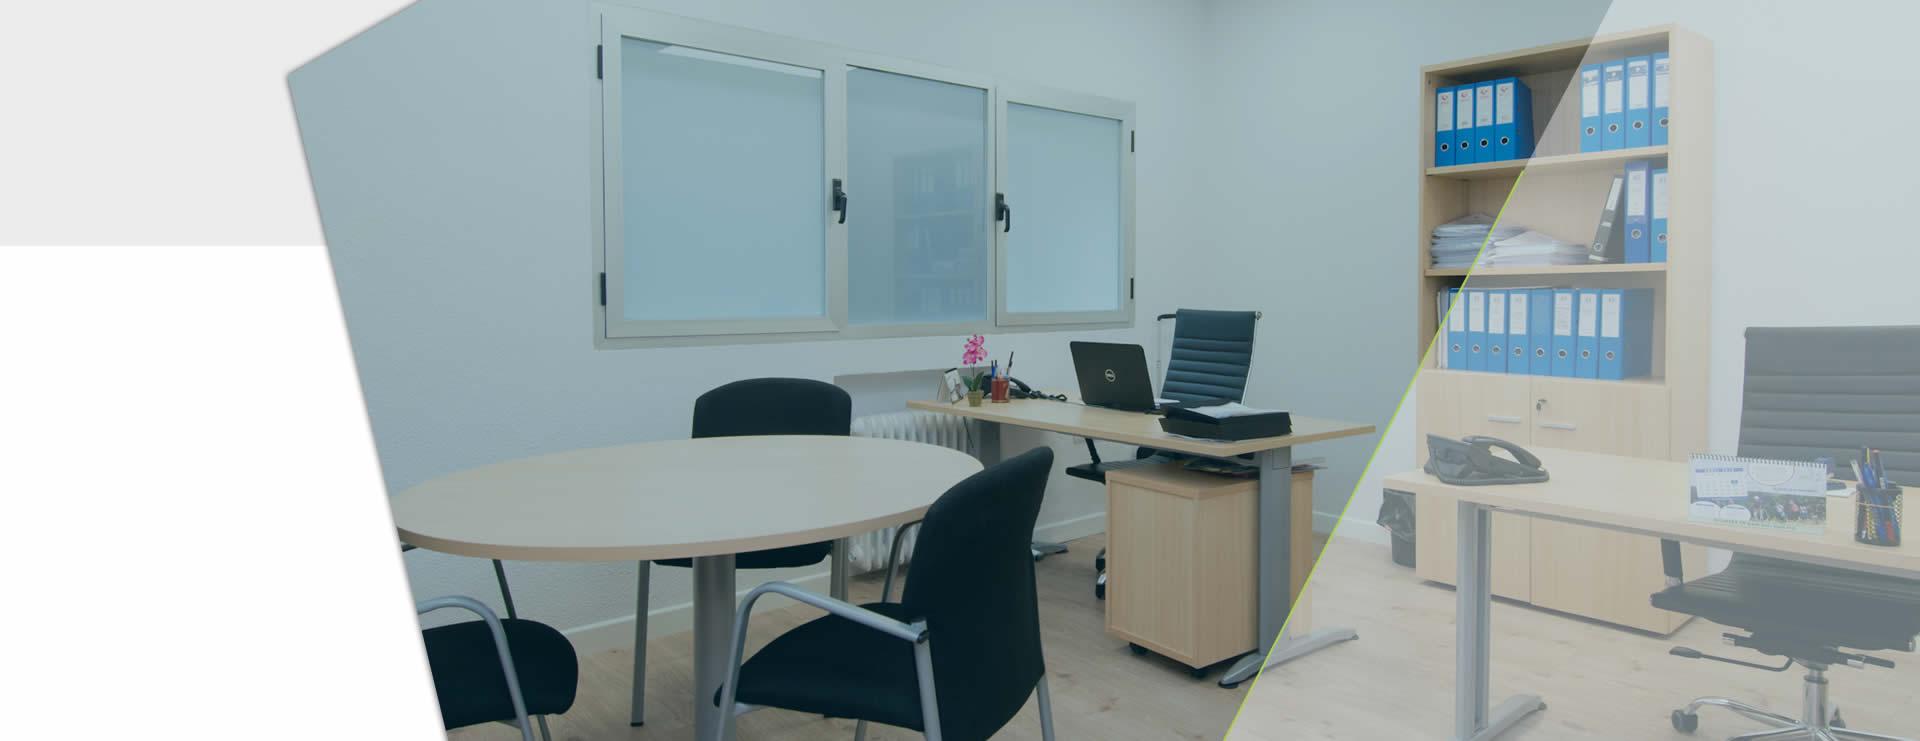 slide2-oficinas